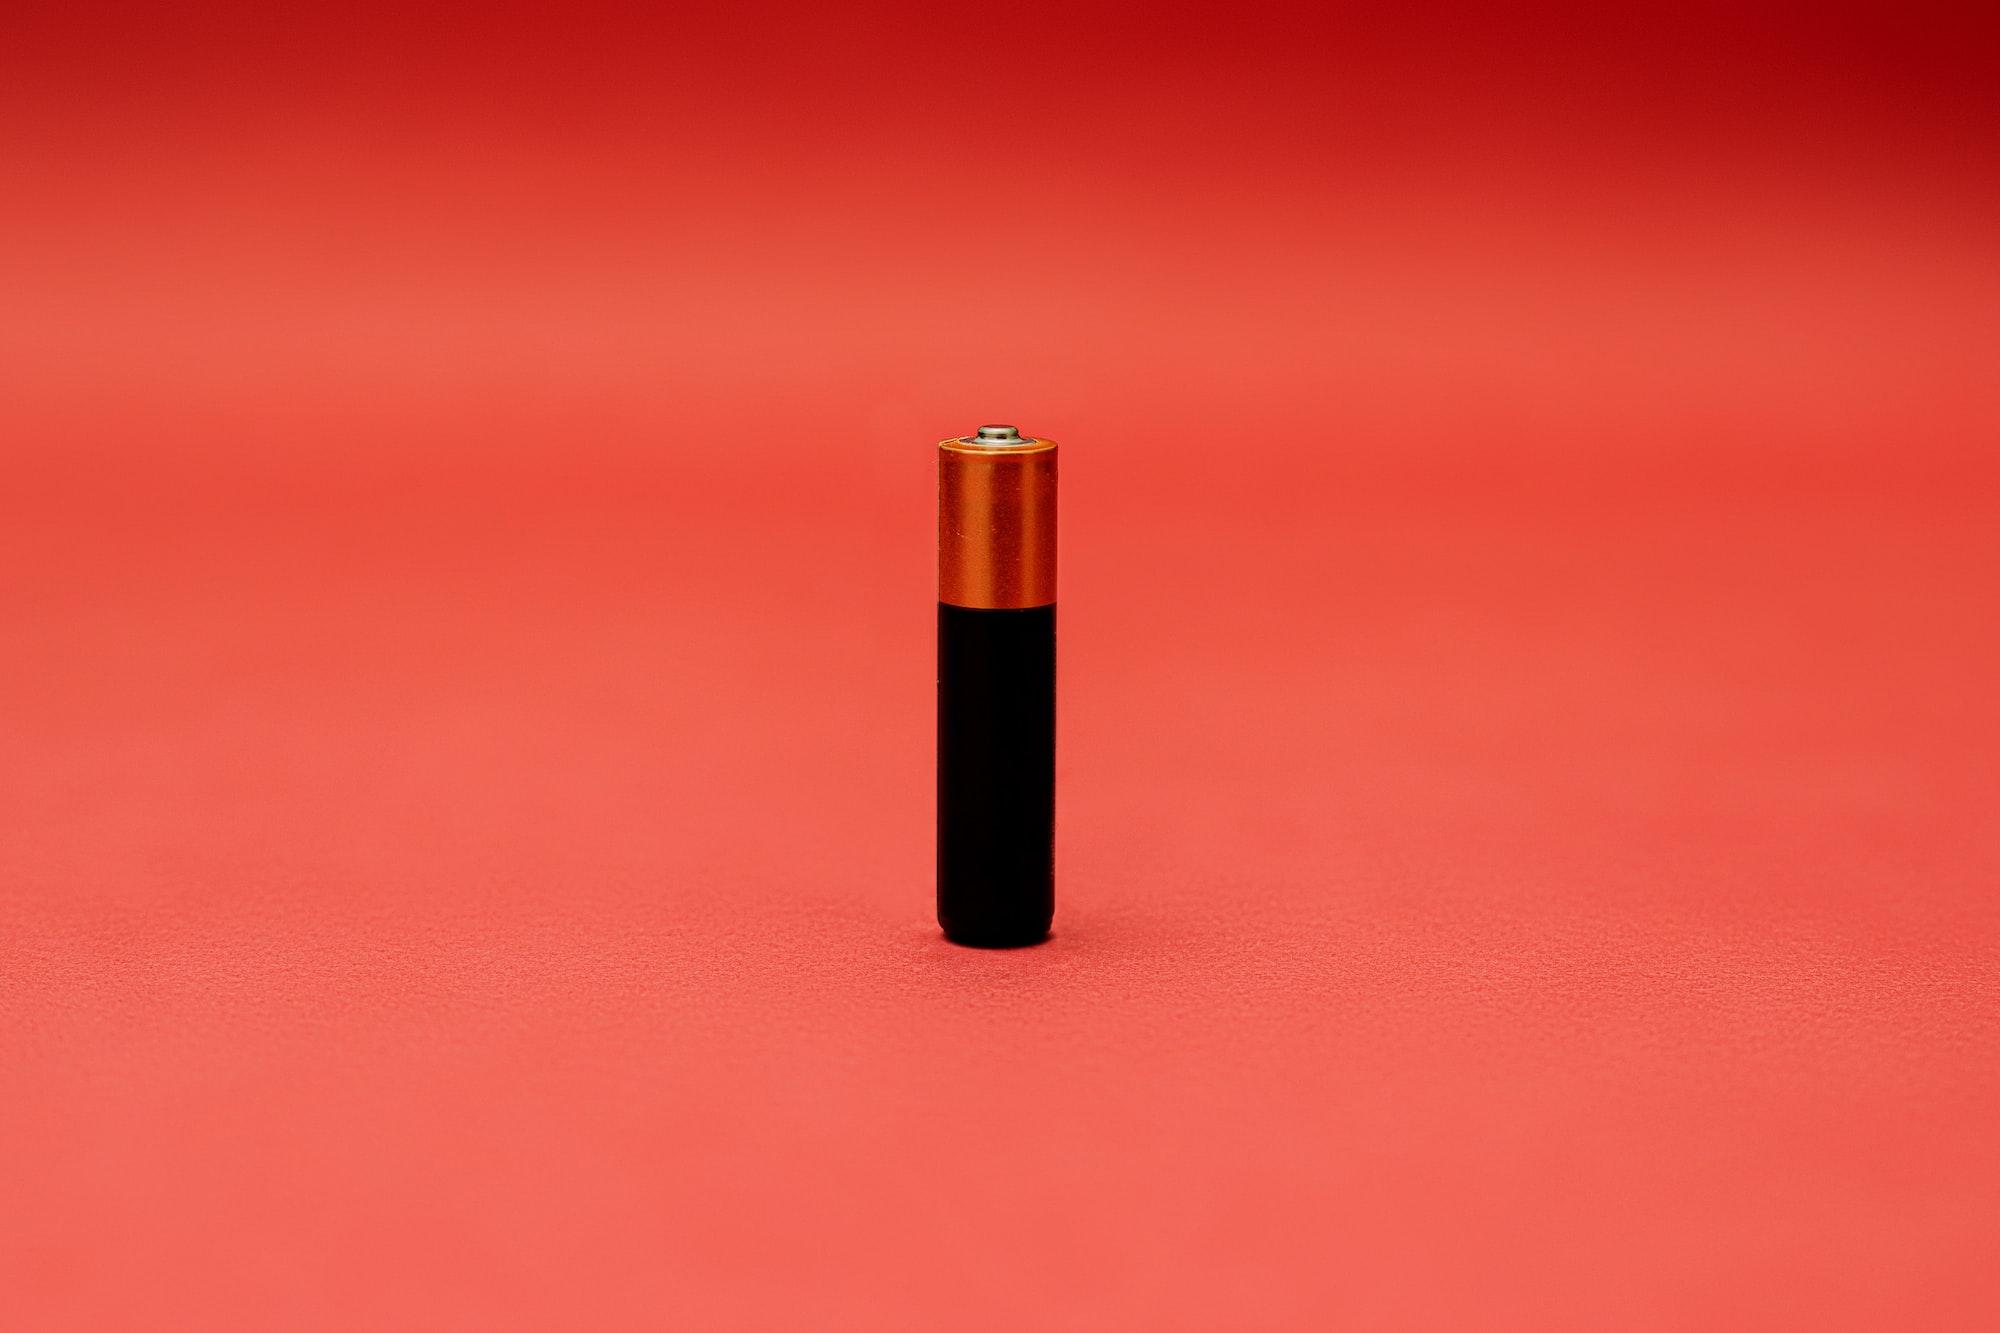 Battery powered Raspberry Pi